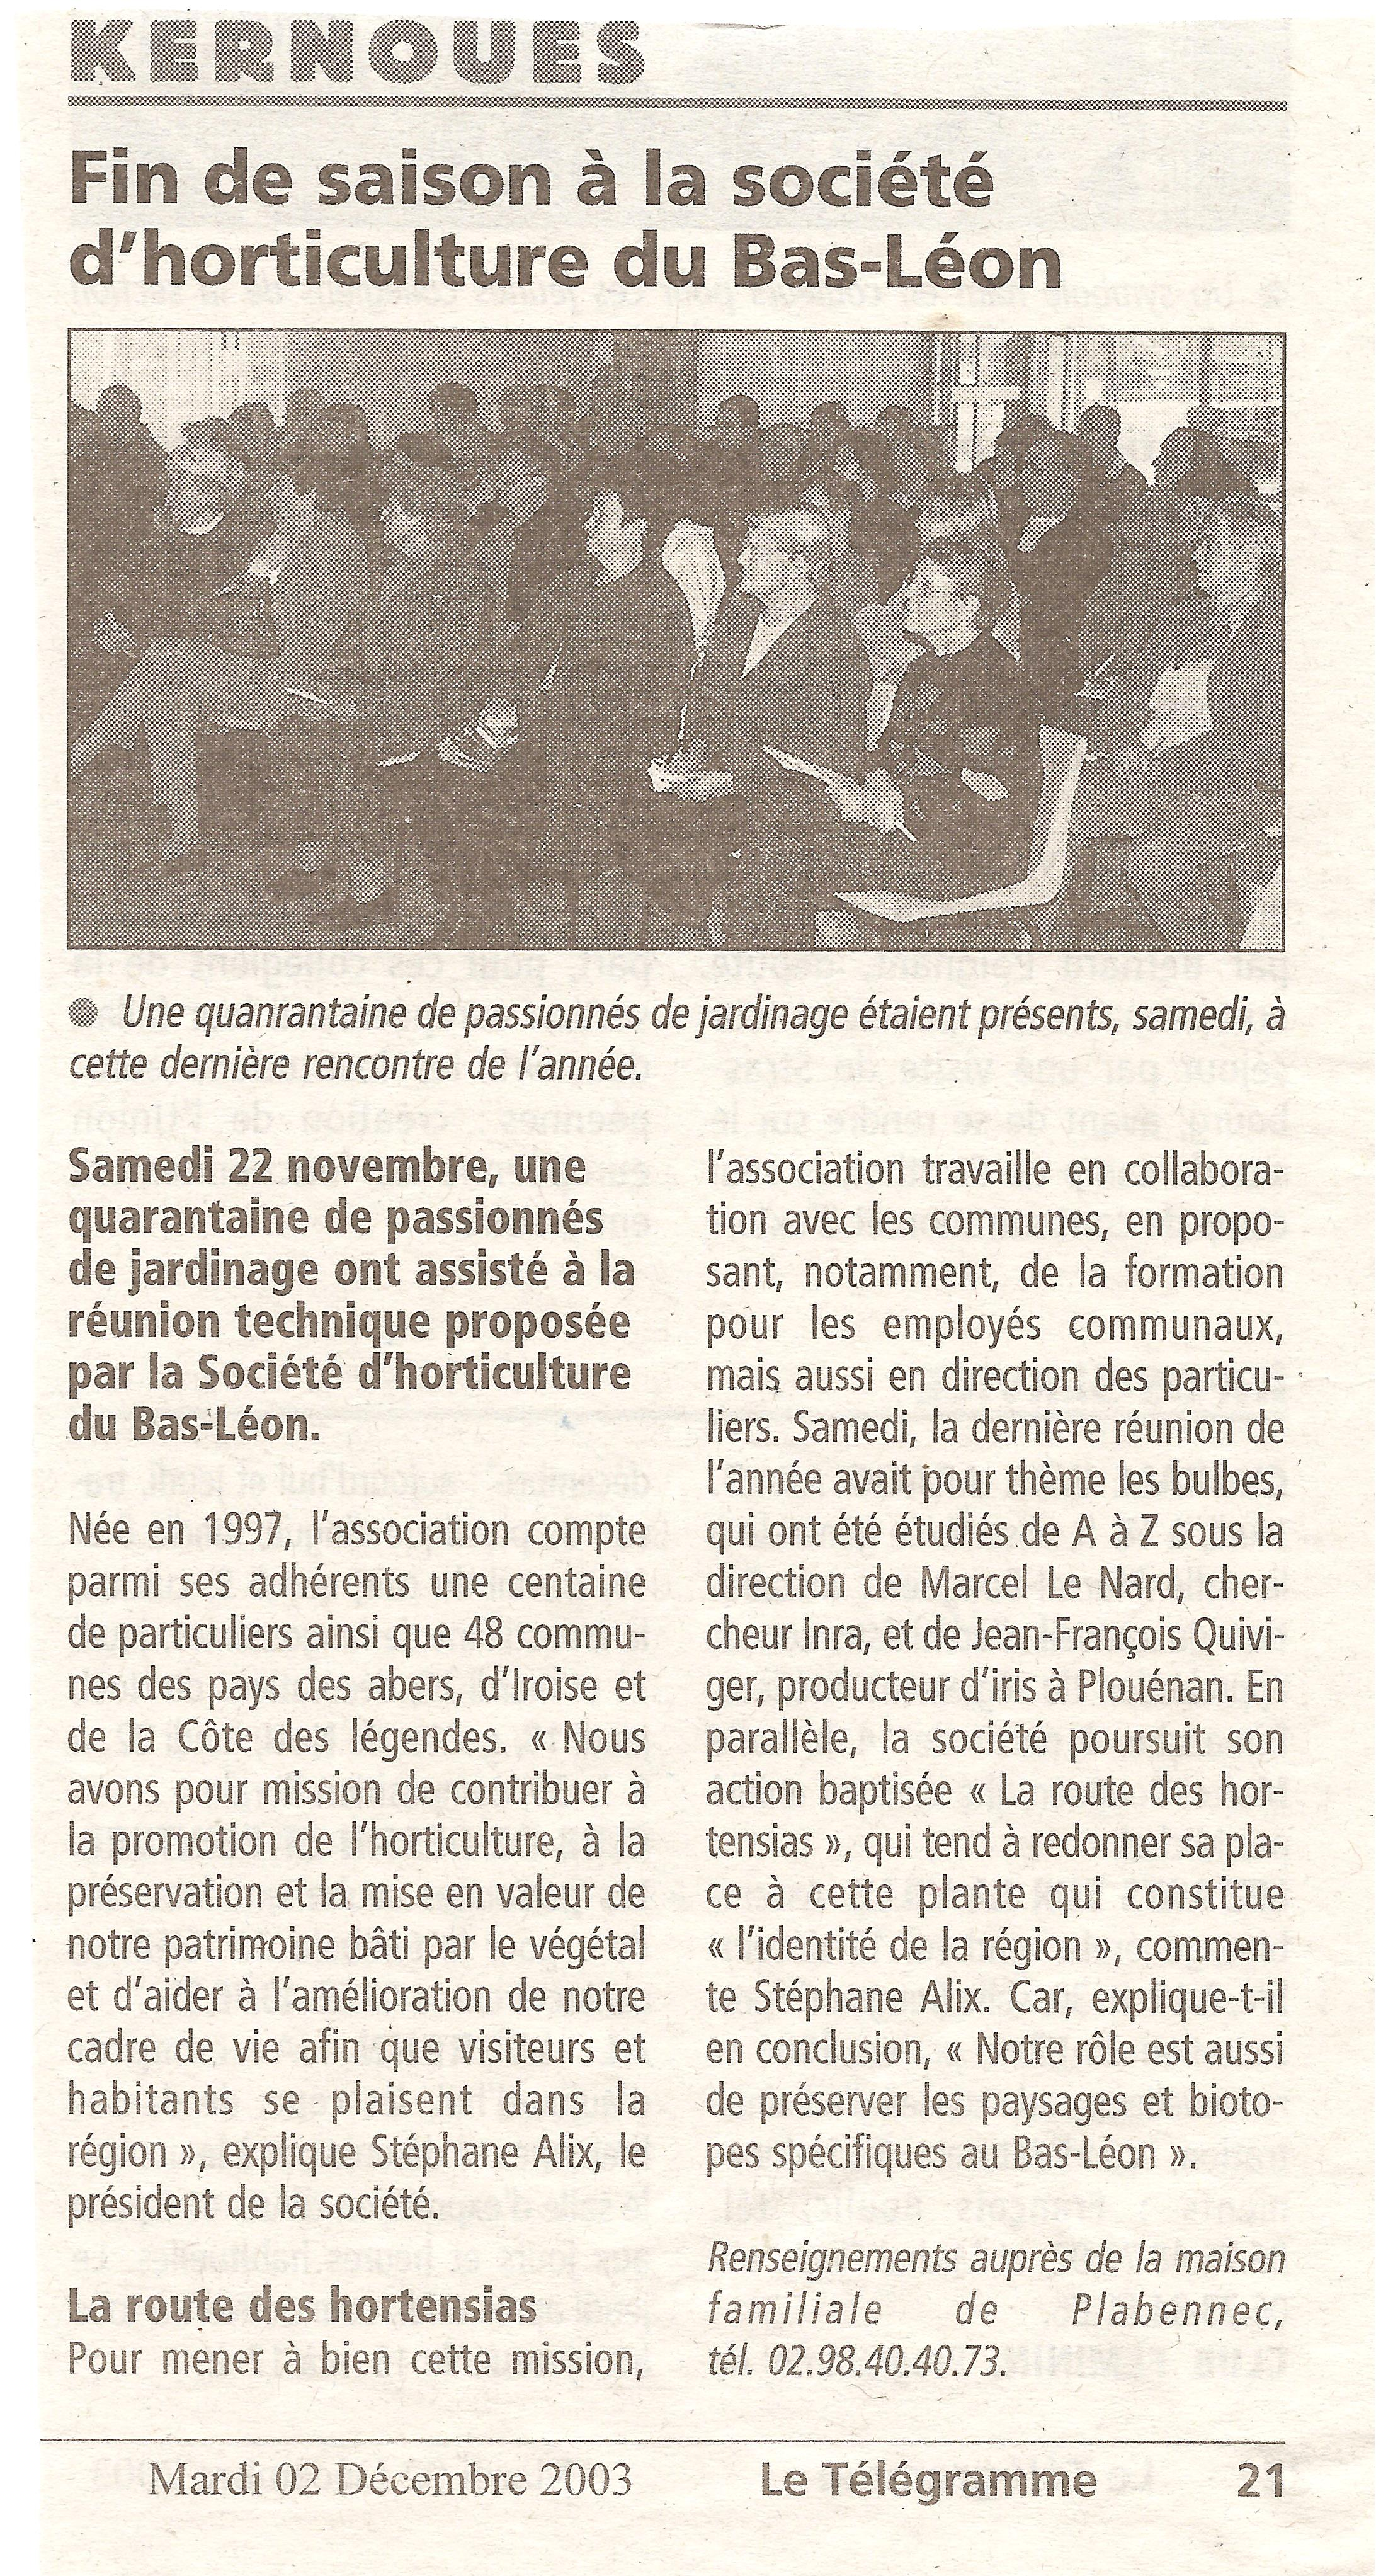 2003 12 02 le telegramme